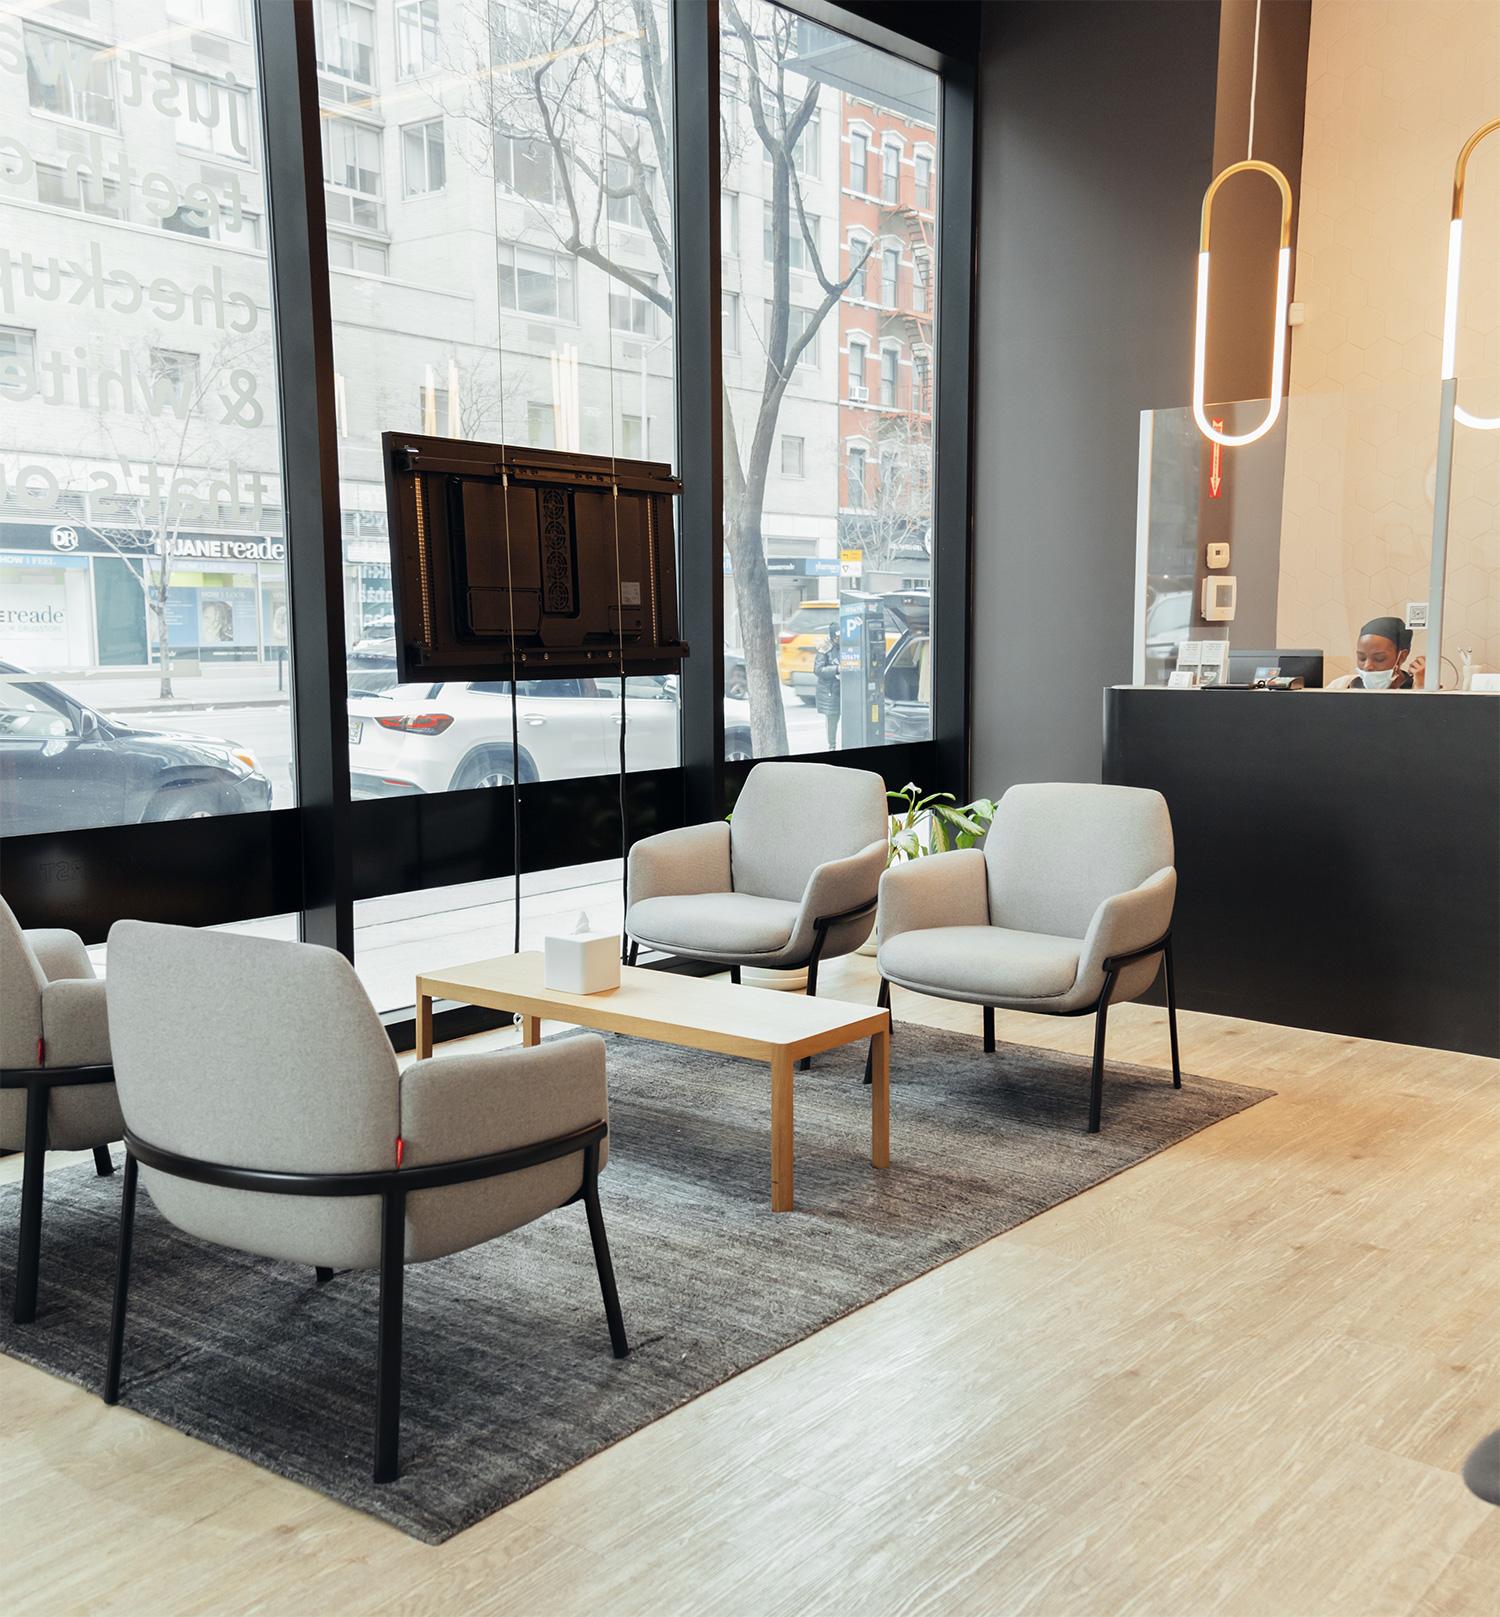 dntl bar Chelsea location's lobby seating near the front desk